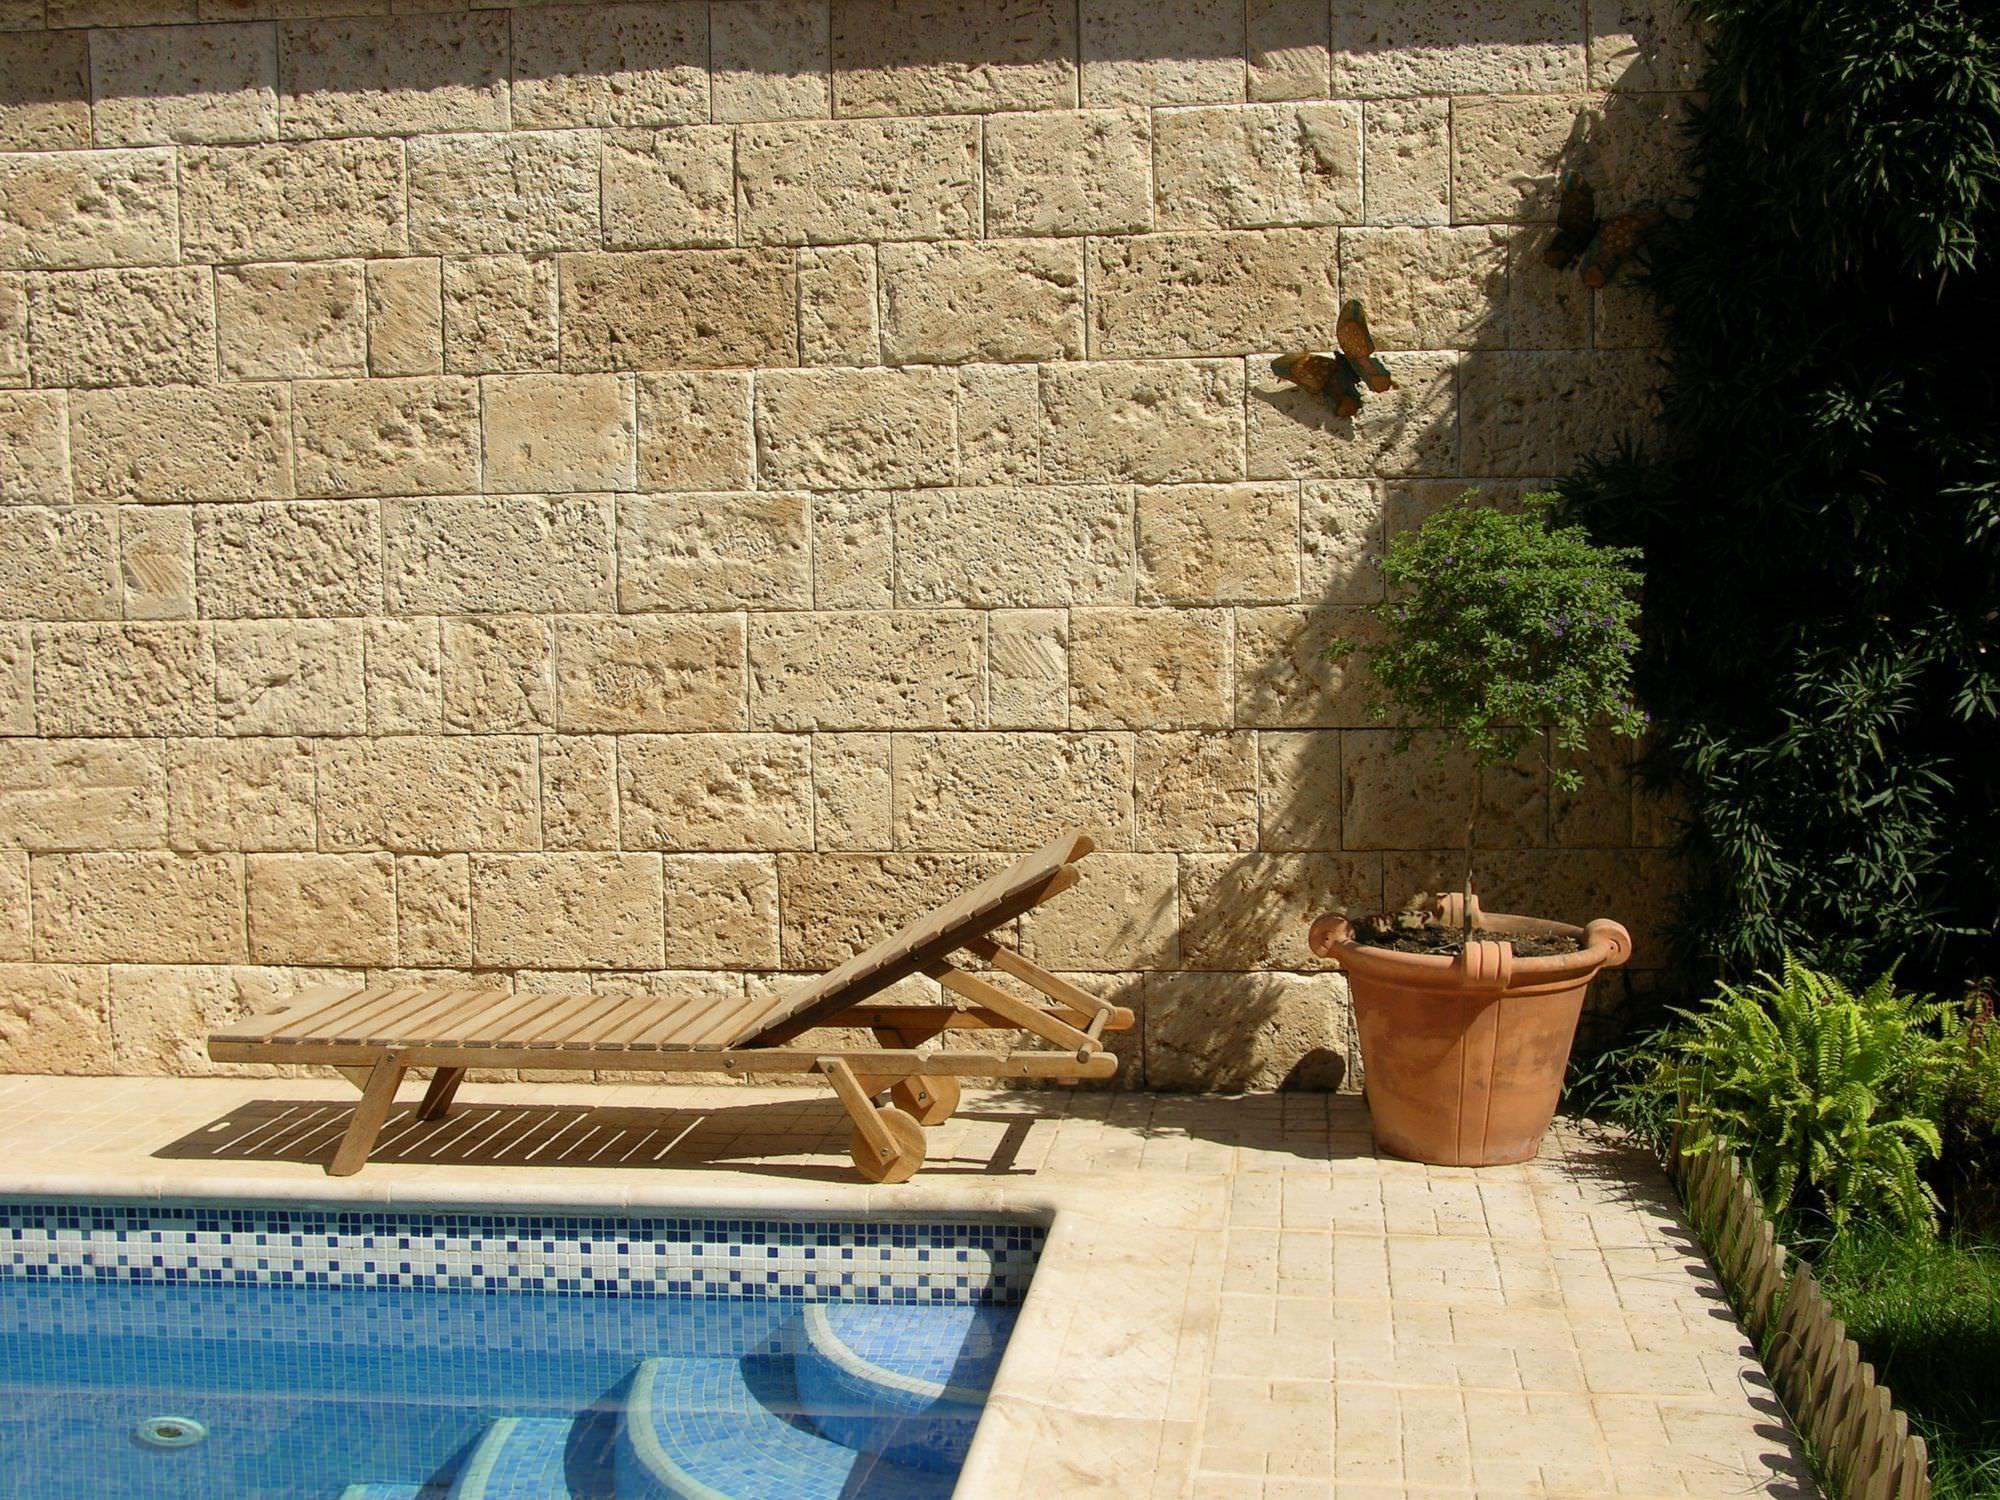 revestimiento de pared de hormign para uso residencial profesional texturado travertino arenado verniprens - Revestimiento De Paredes Exteriores